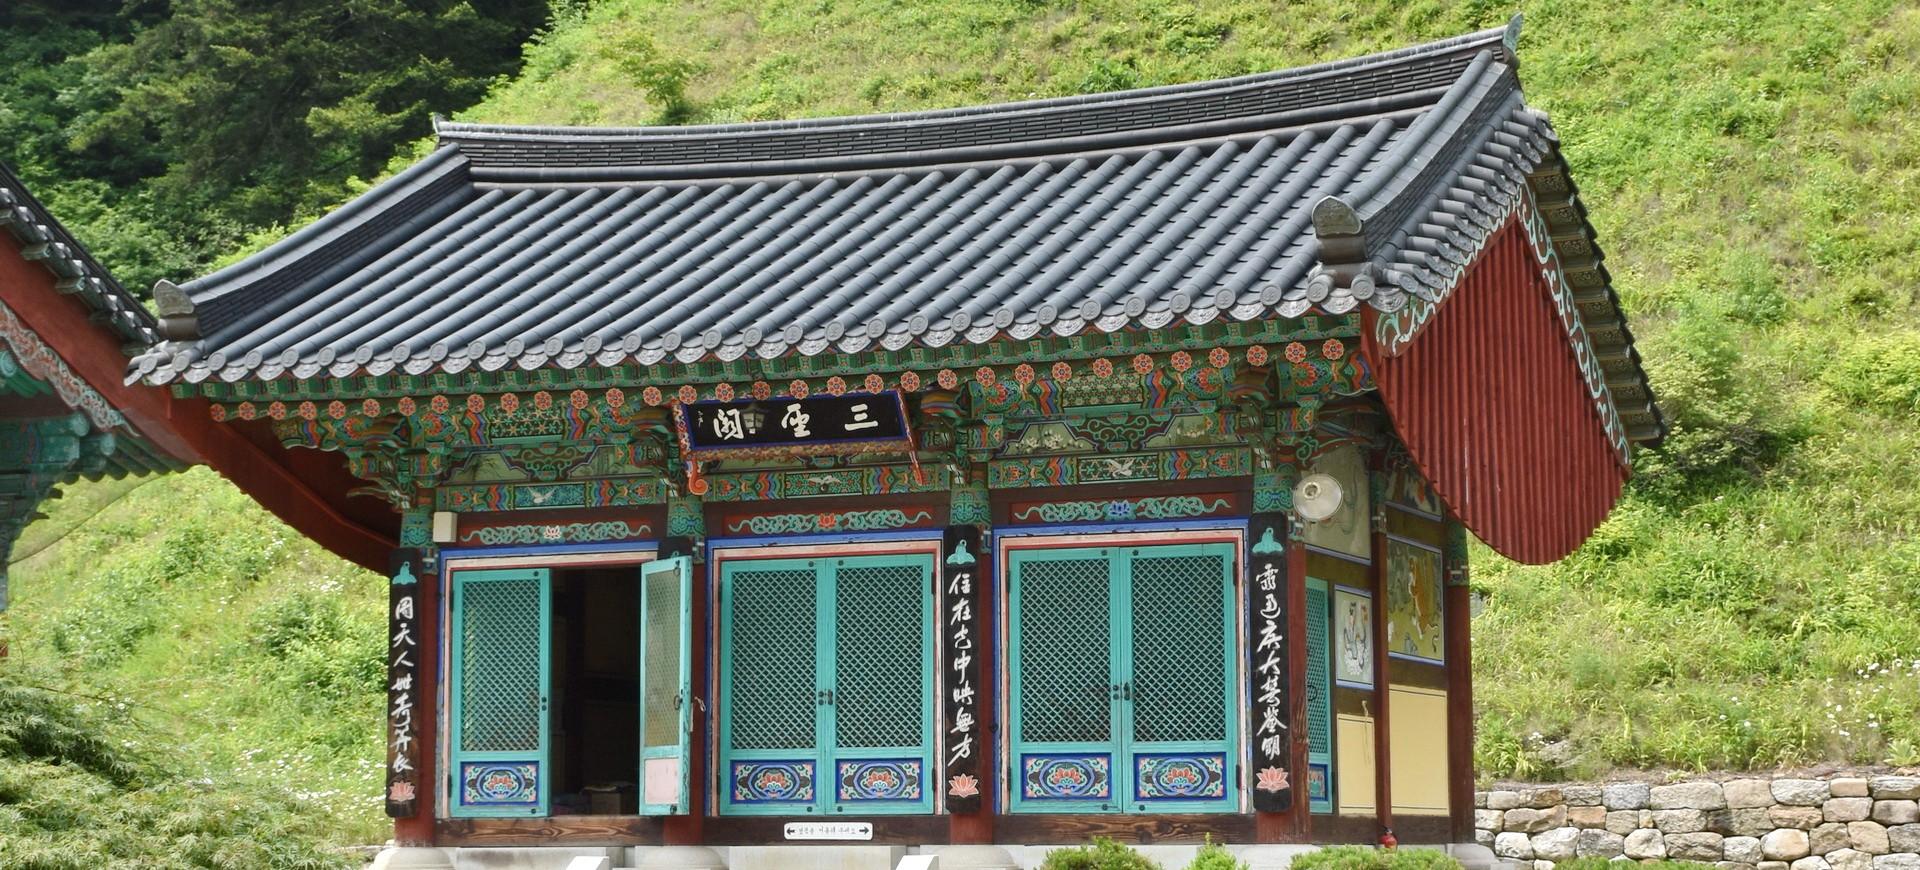 Temple Wolijeongsa à Pyeongchang en Corée du Sud